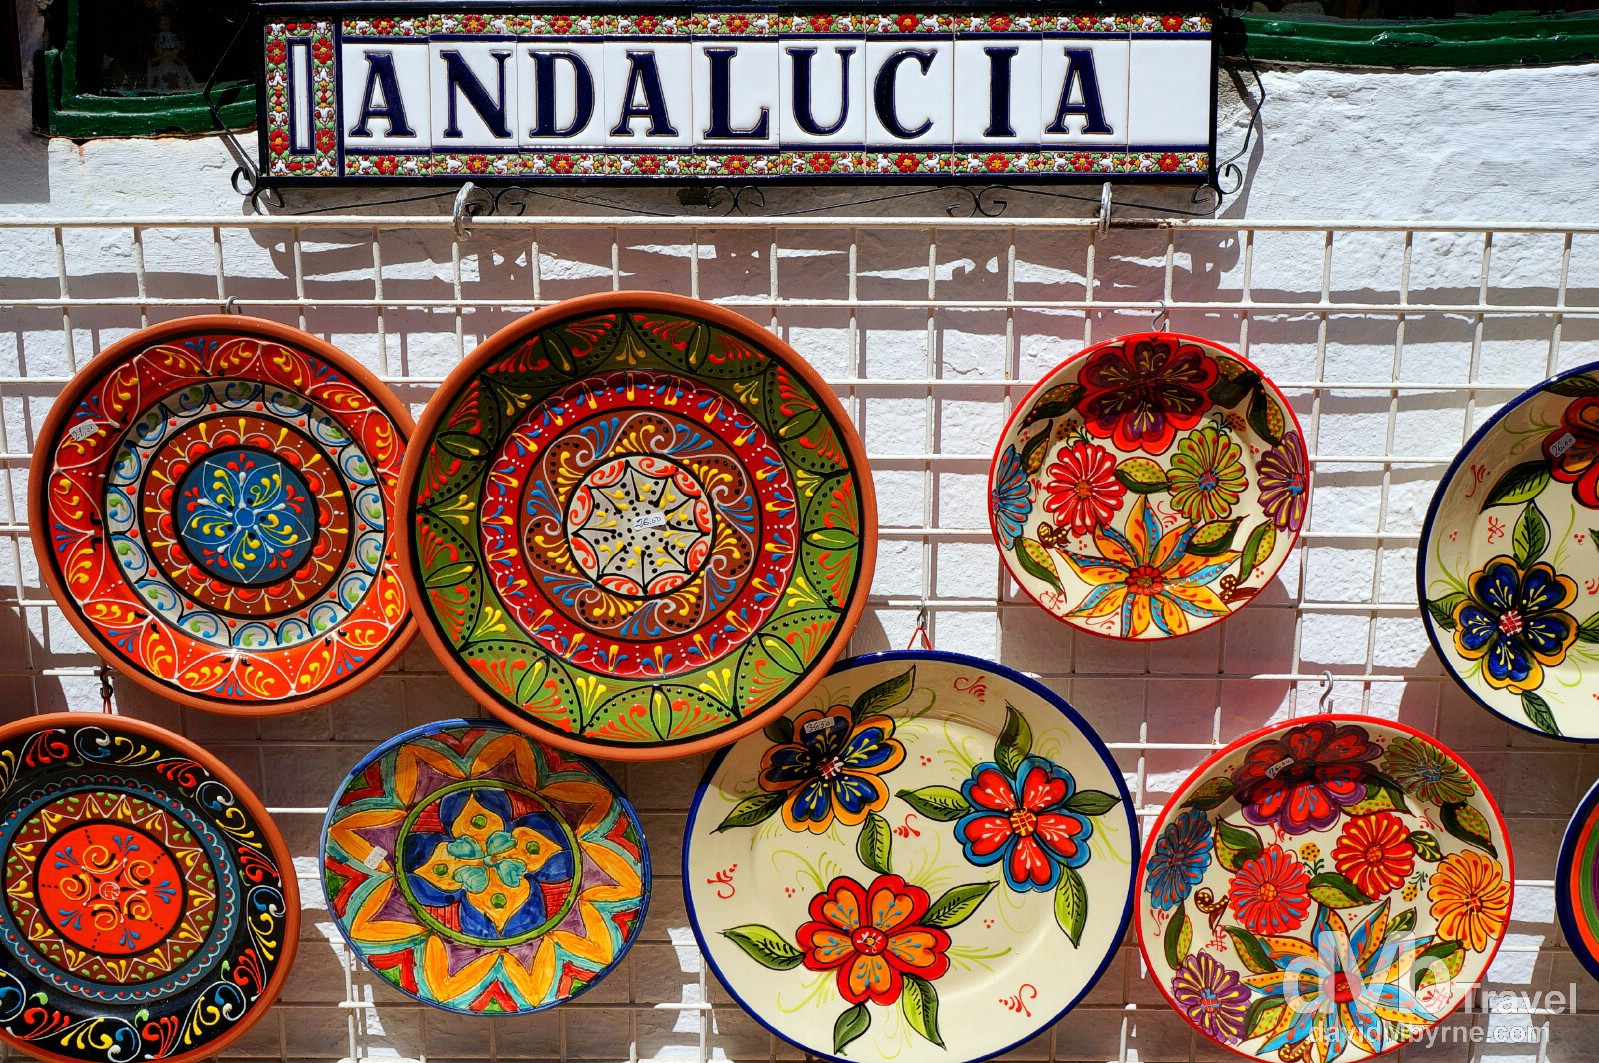 Plaza de los Naranjos, Marbella, Andalusia, Spain. June 7th, 2014.